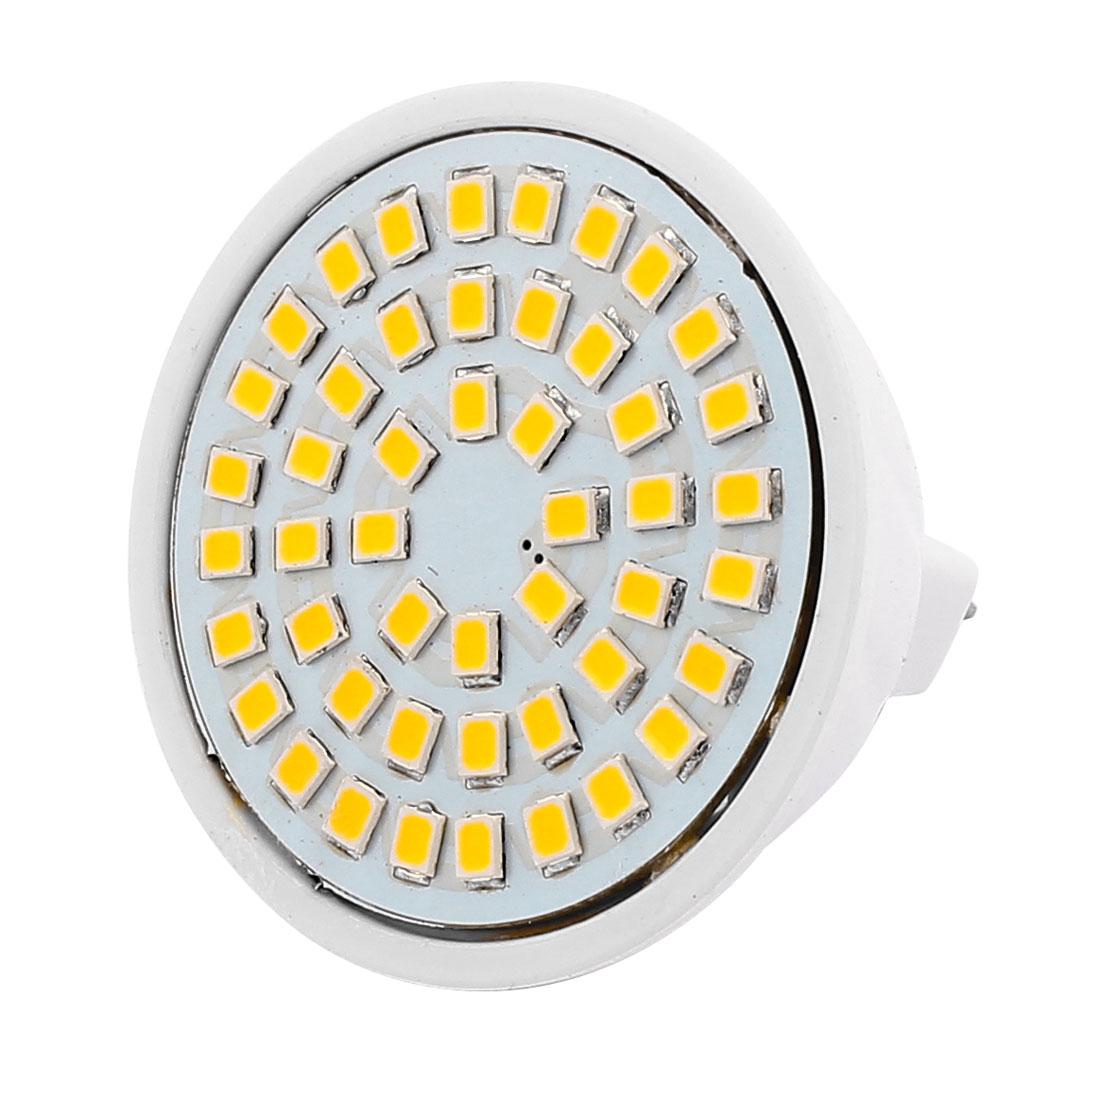 MR16 SMD 2835 48 LEDs Plastic Energy-Saving LED Lamp Bulb Warm White AC 220V 4W